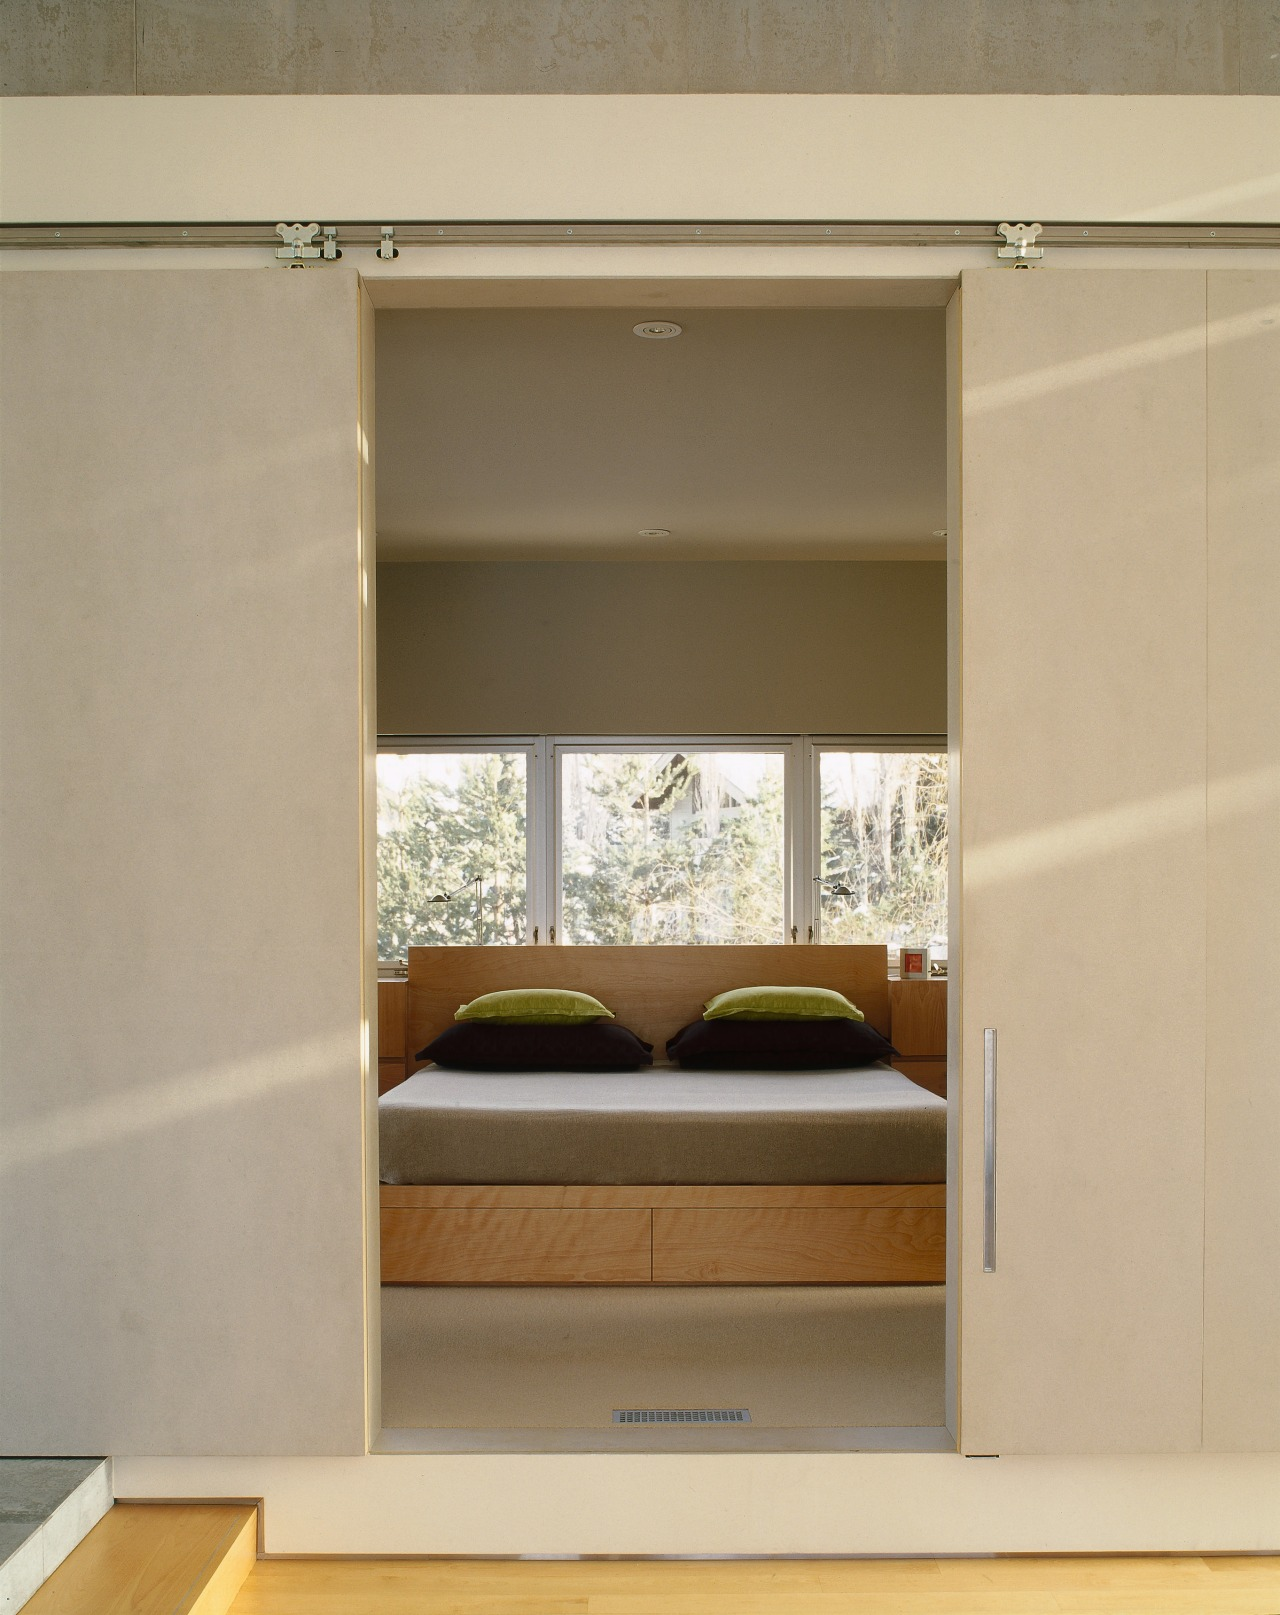 A view of the master suite. furniture, interior design, wardrobe, orange, brown